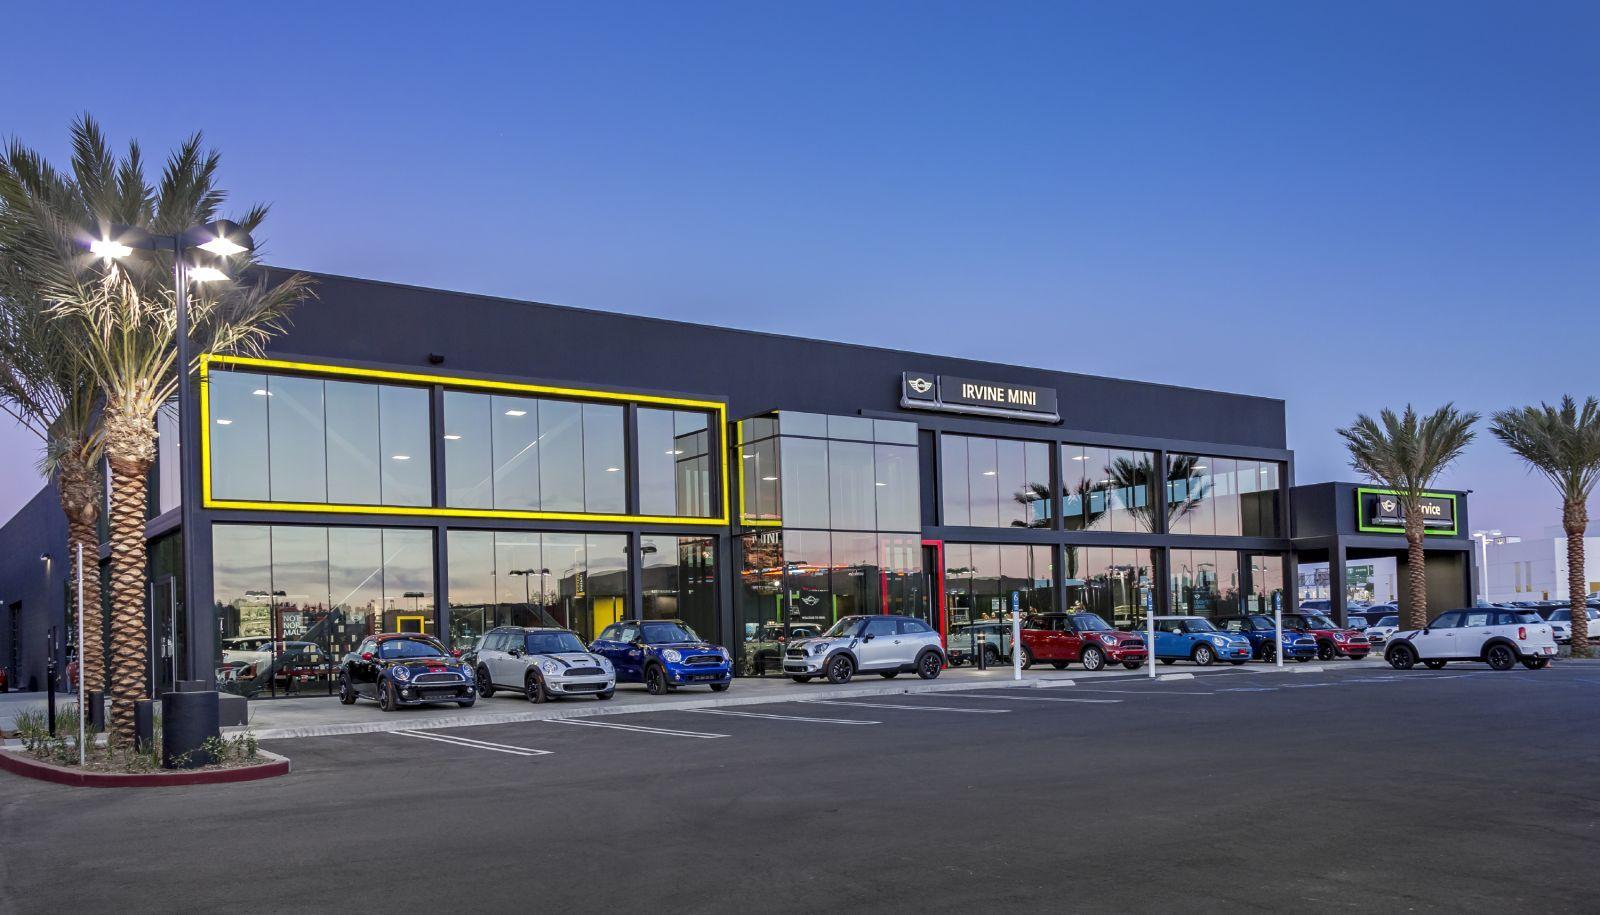 Shelly Automotive Group Bmw Mercedes Benz Mini Orange County Los Angeles California Car Showroom Design Bmw Dealership Bmw